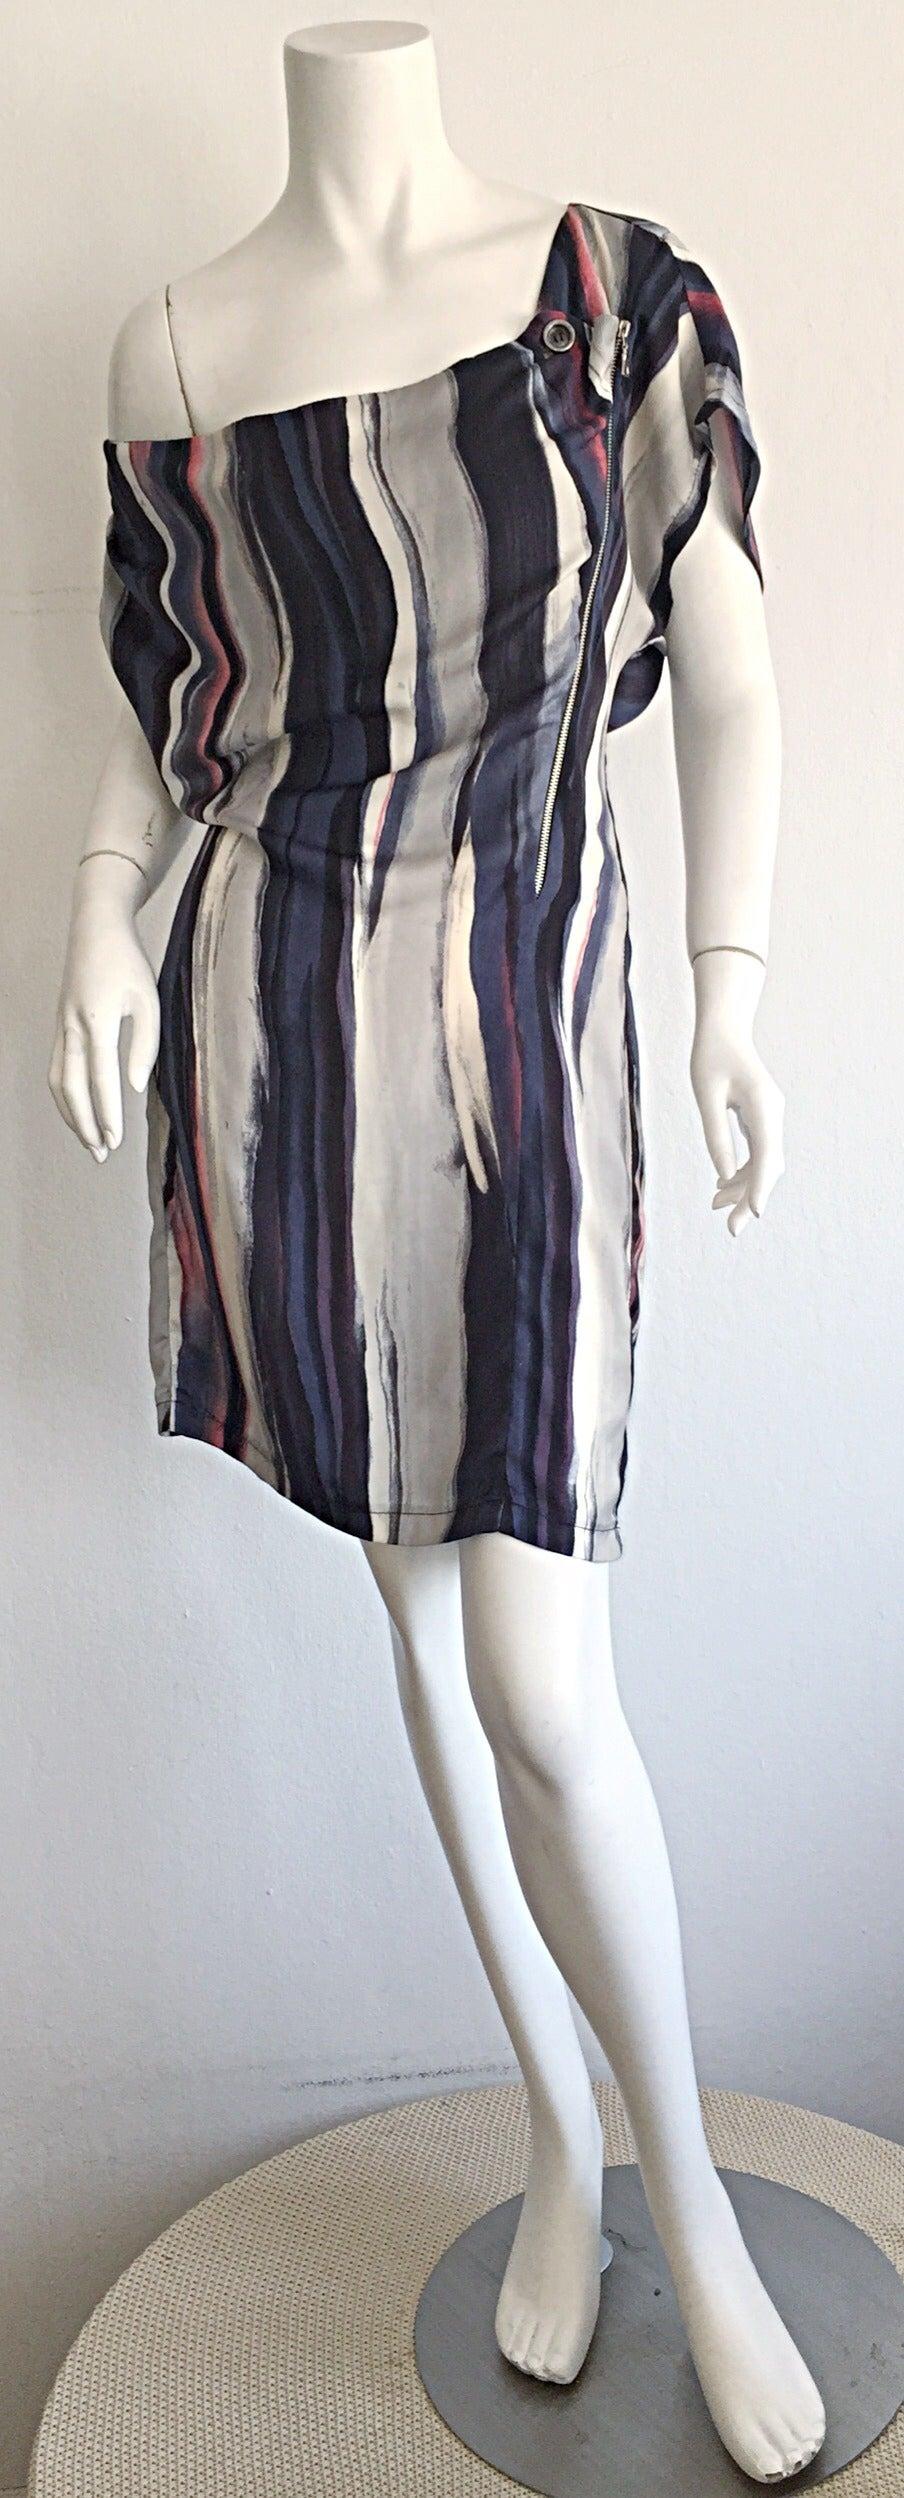 Maeva Striped Watercolor Zipper Dress Made In Italy Hard